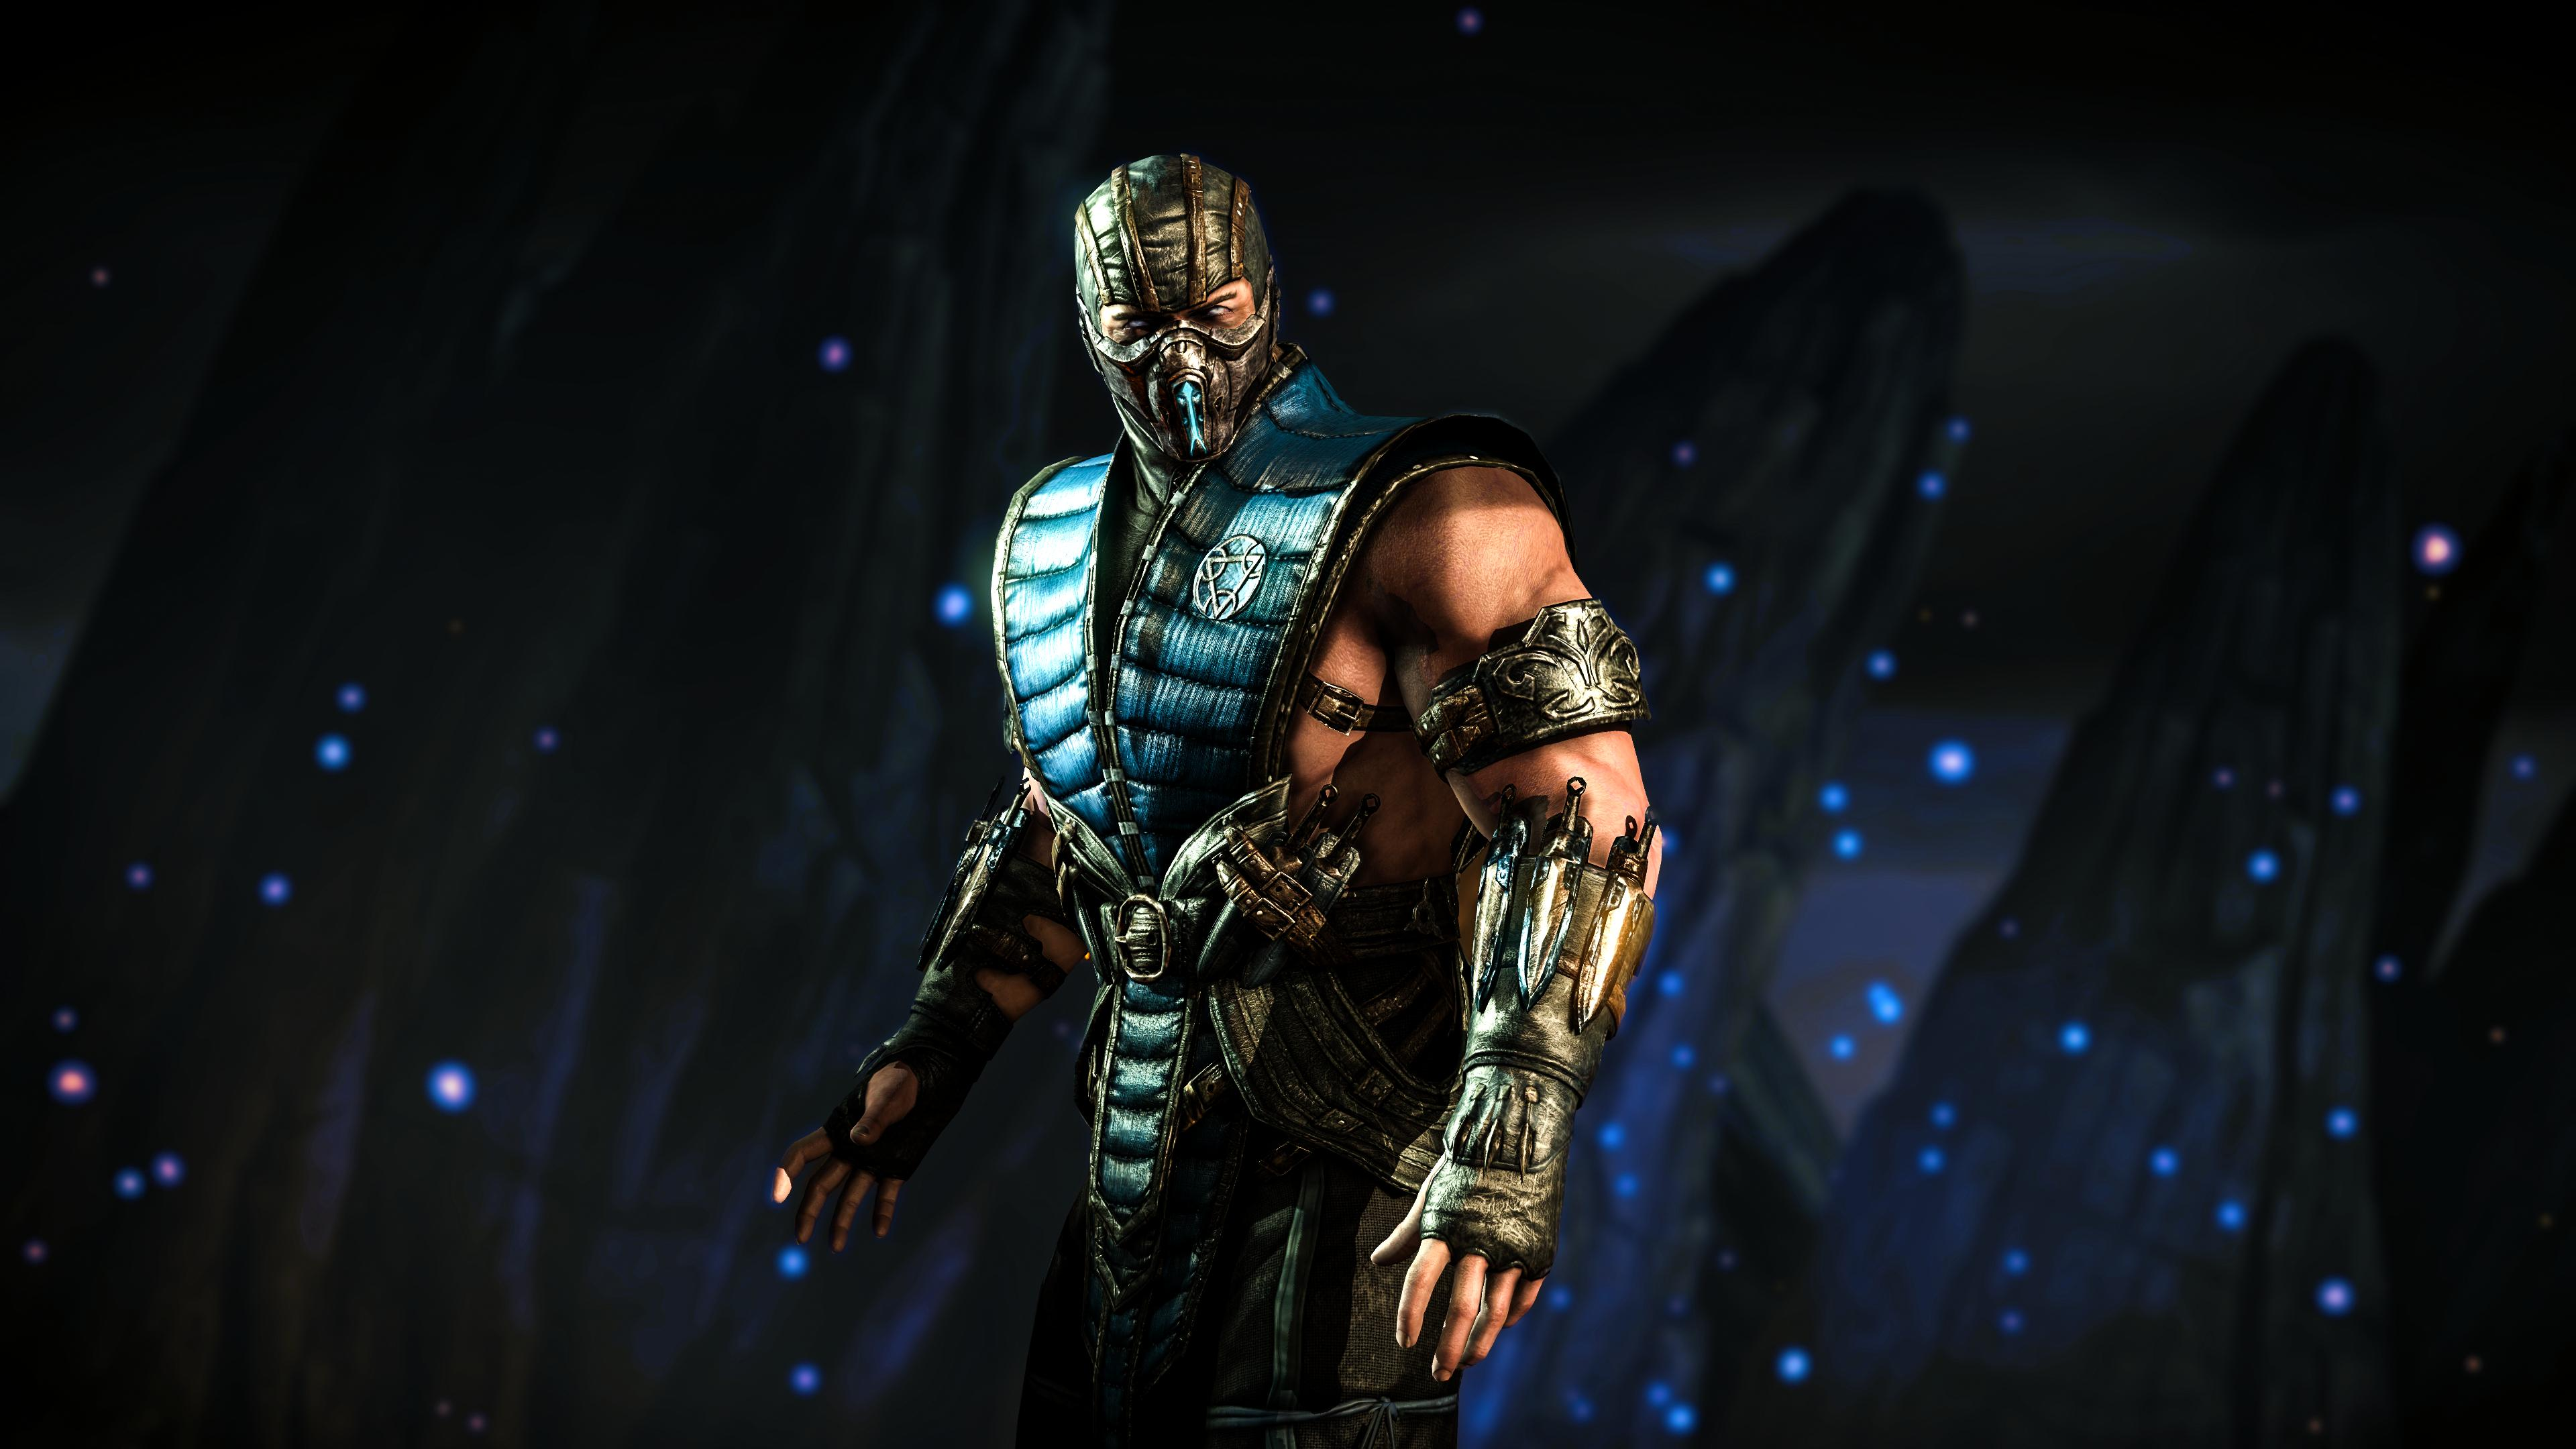 4k Mortal Kombat Wallpapers Top Free 4k Mortal Kombat Backgrounds